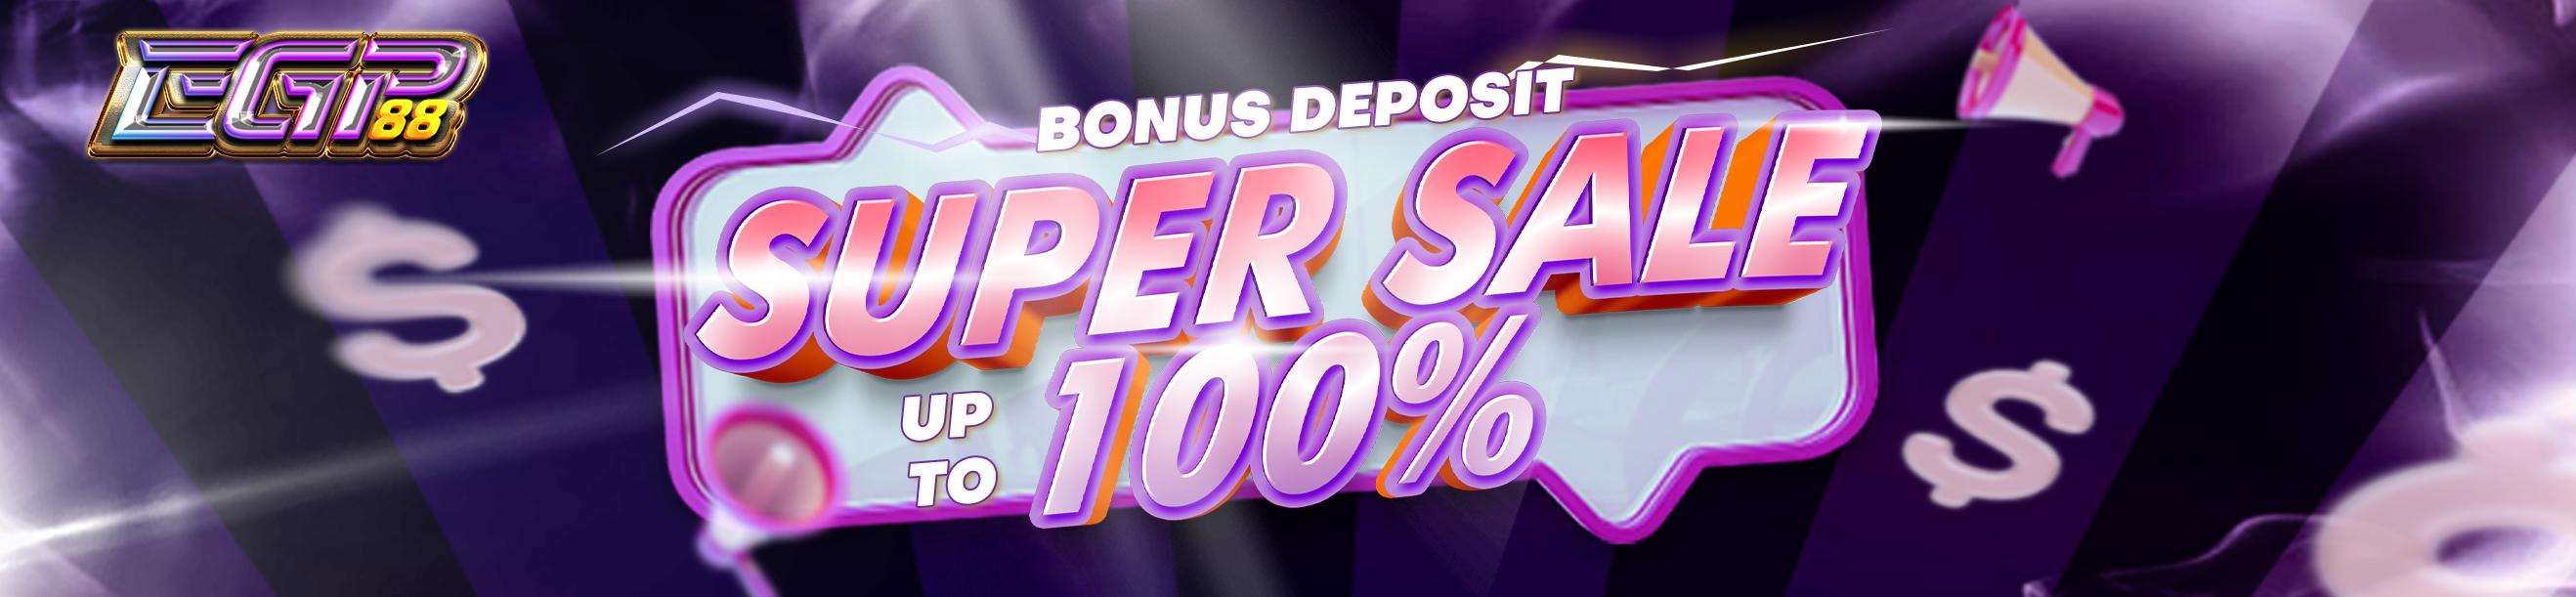 Super Sale 100%